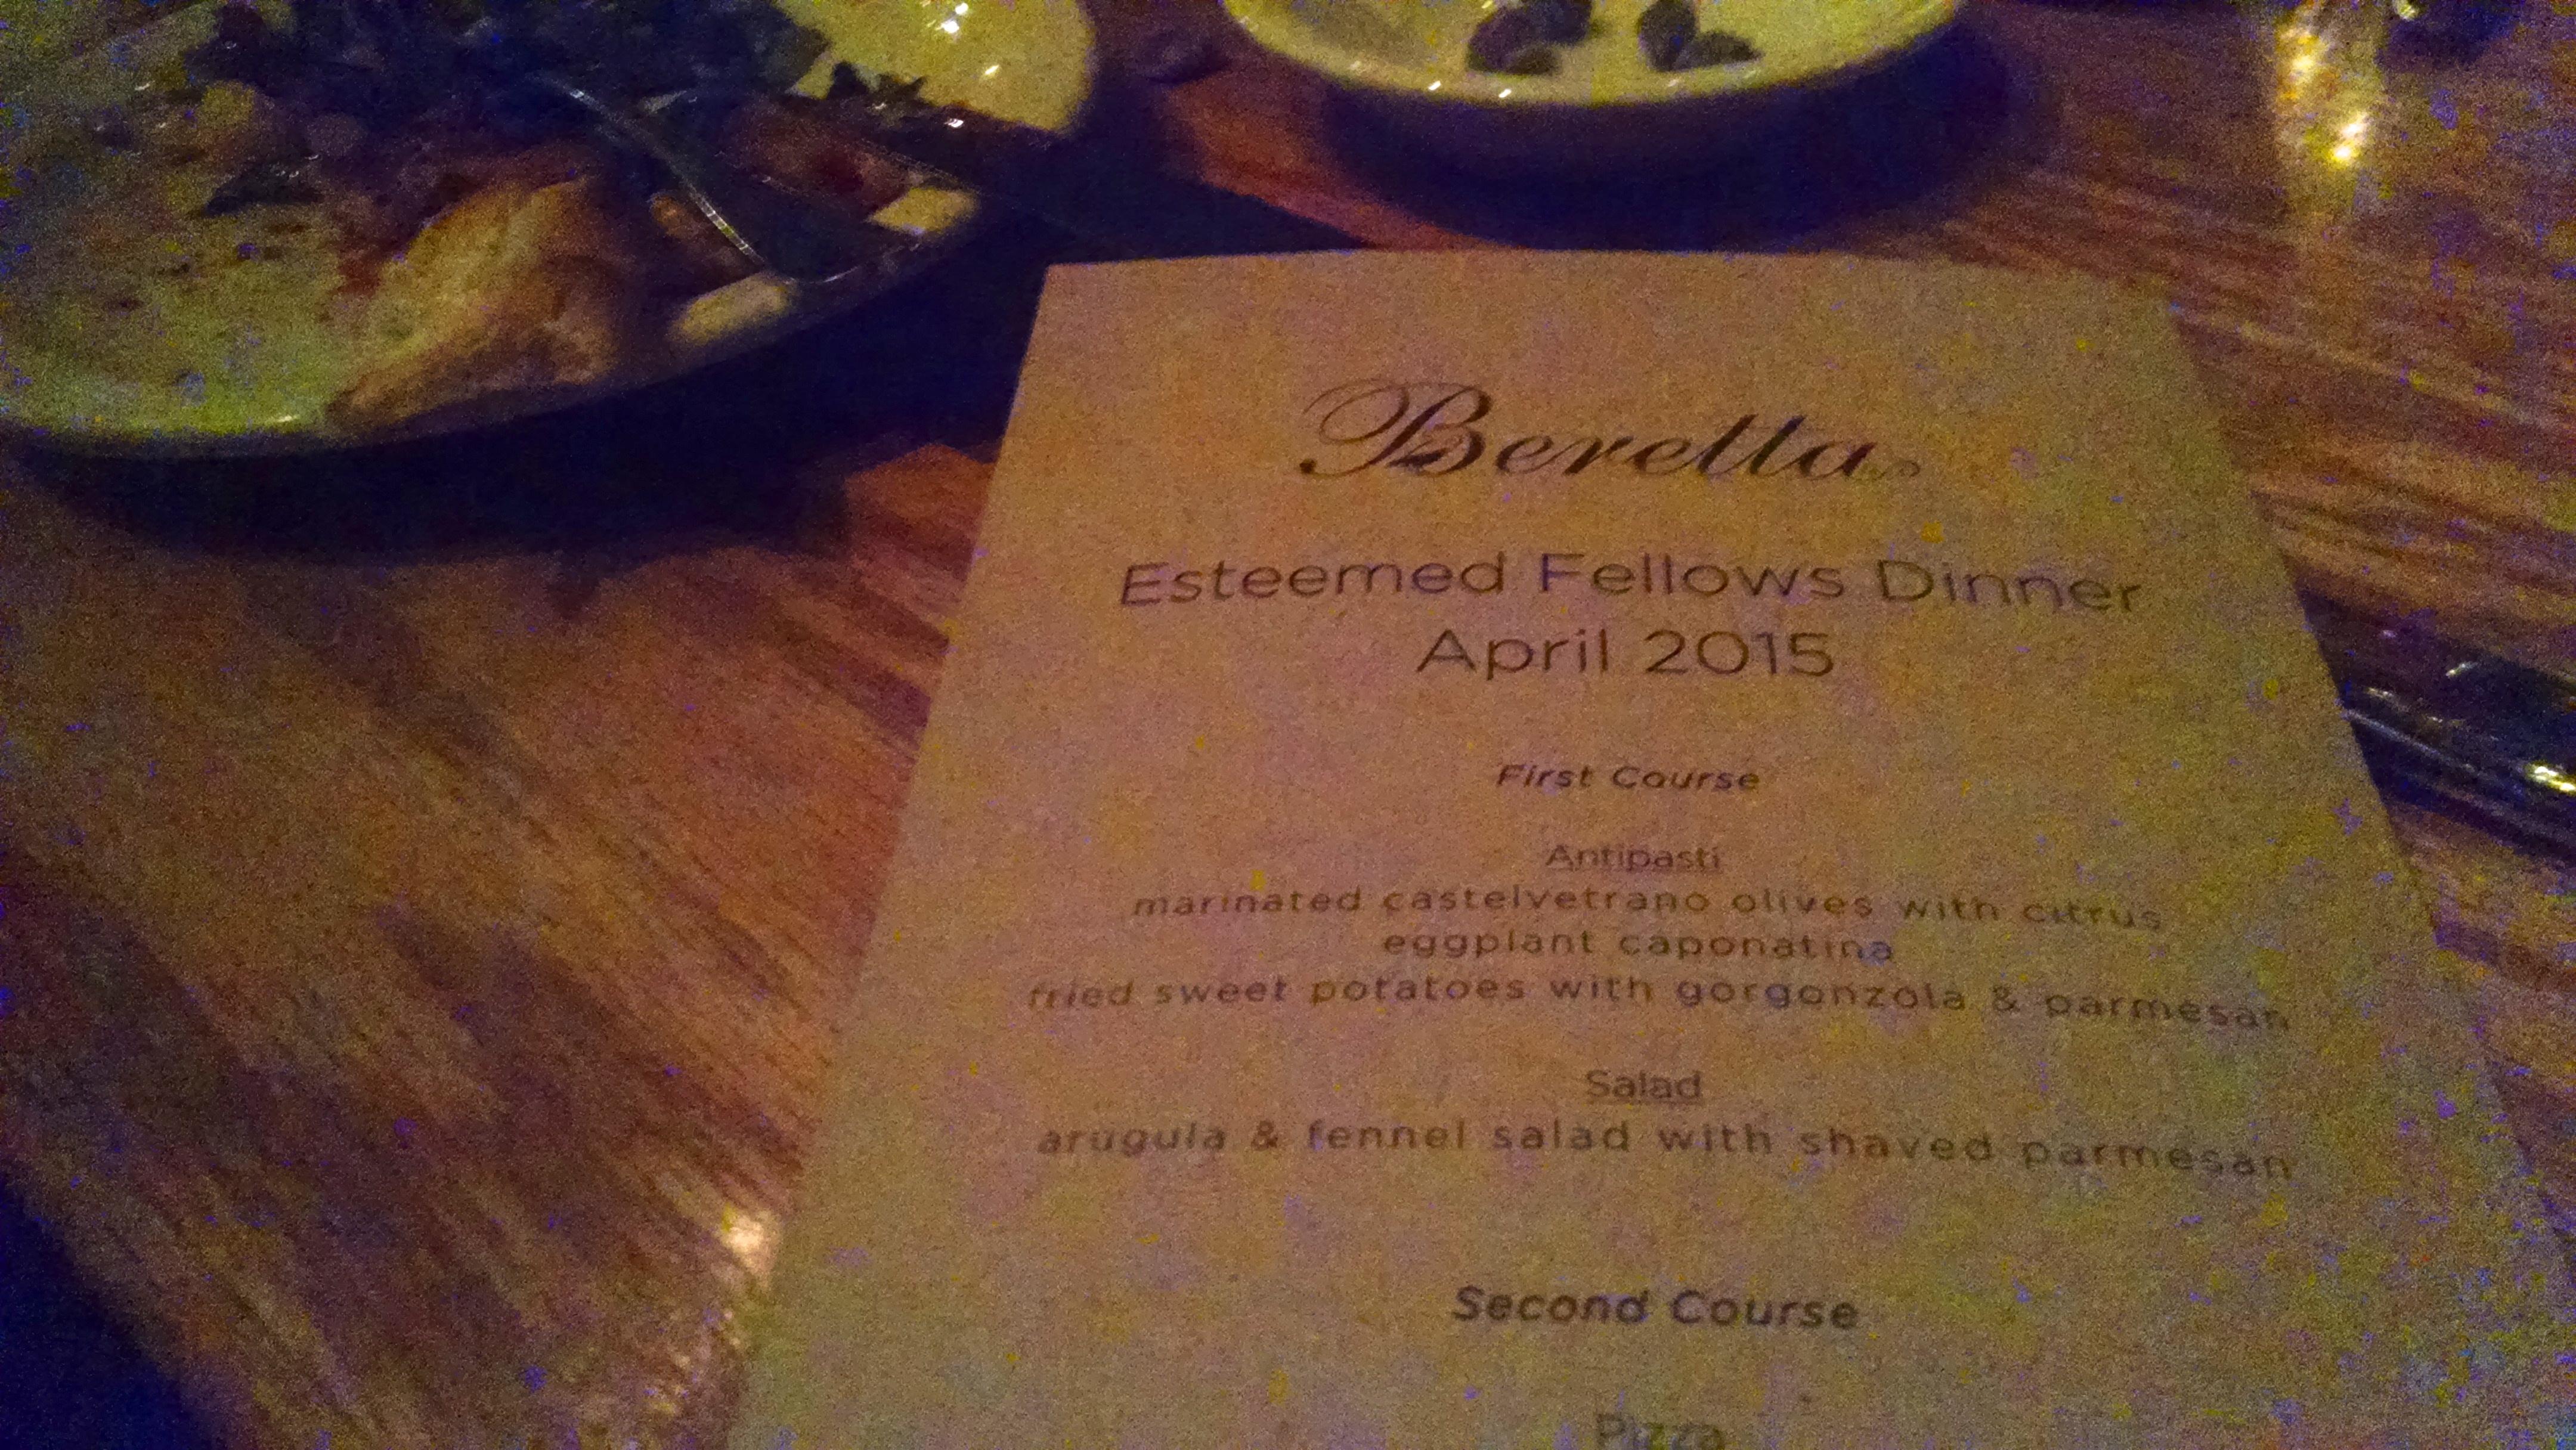 Esteemed Fellows Dinner April 2015 San Francisco